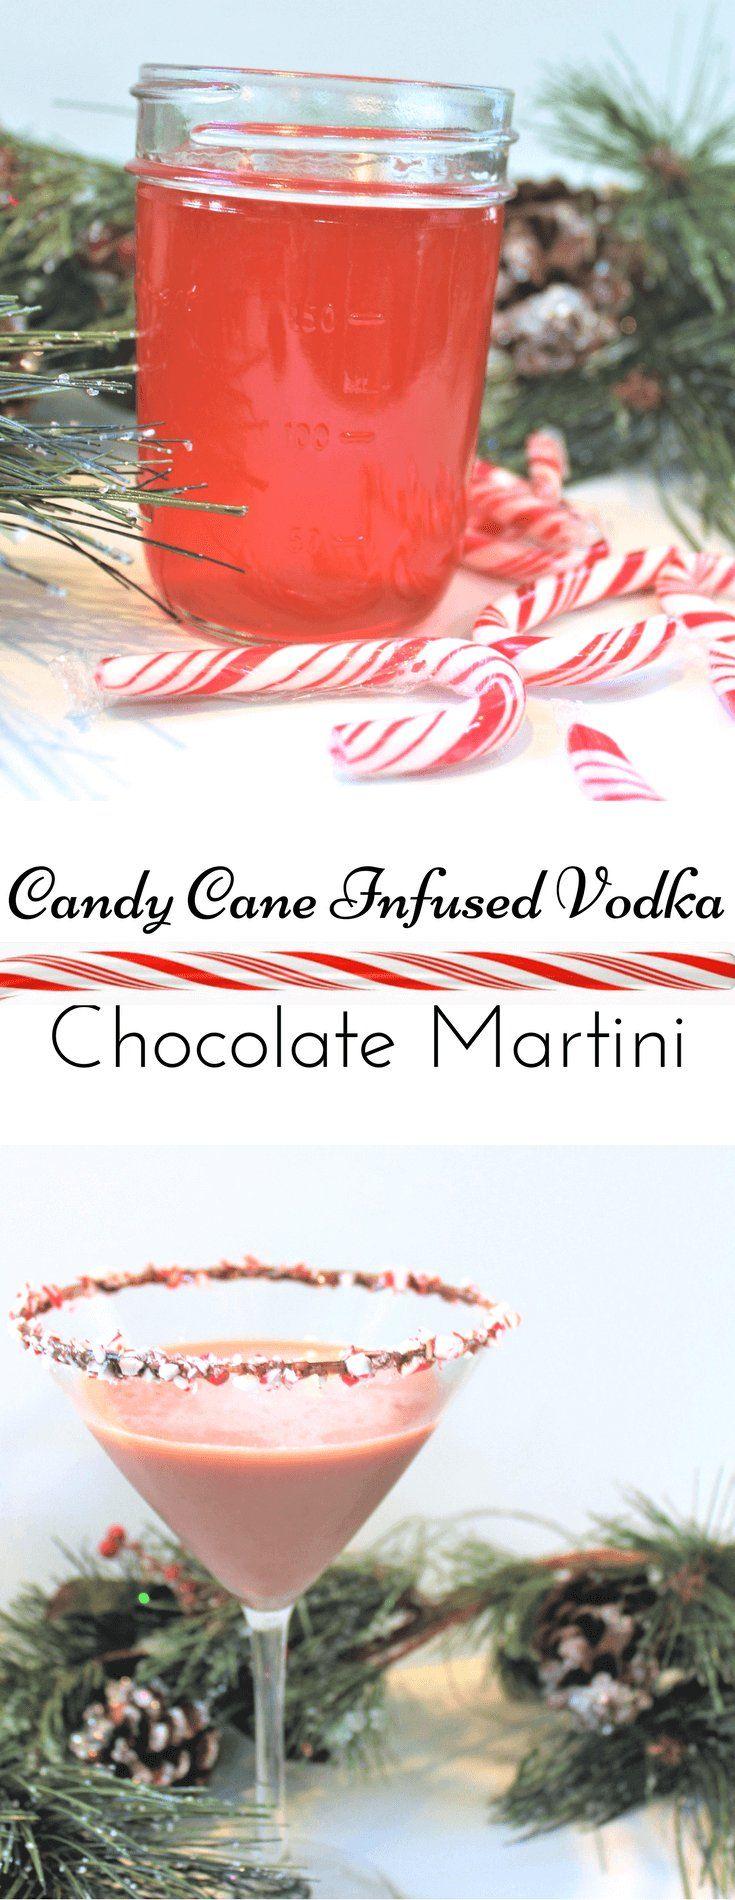 how to make a chocolate martini with chocolate vodka